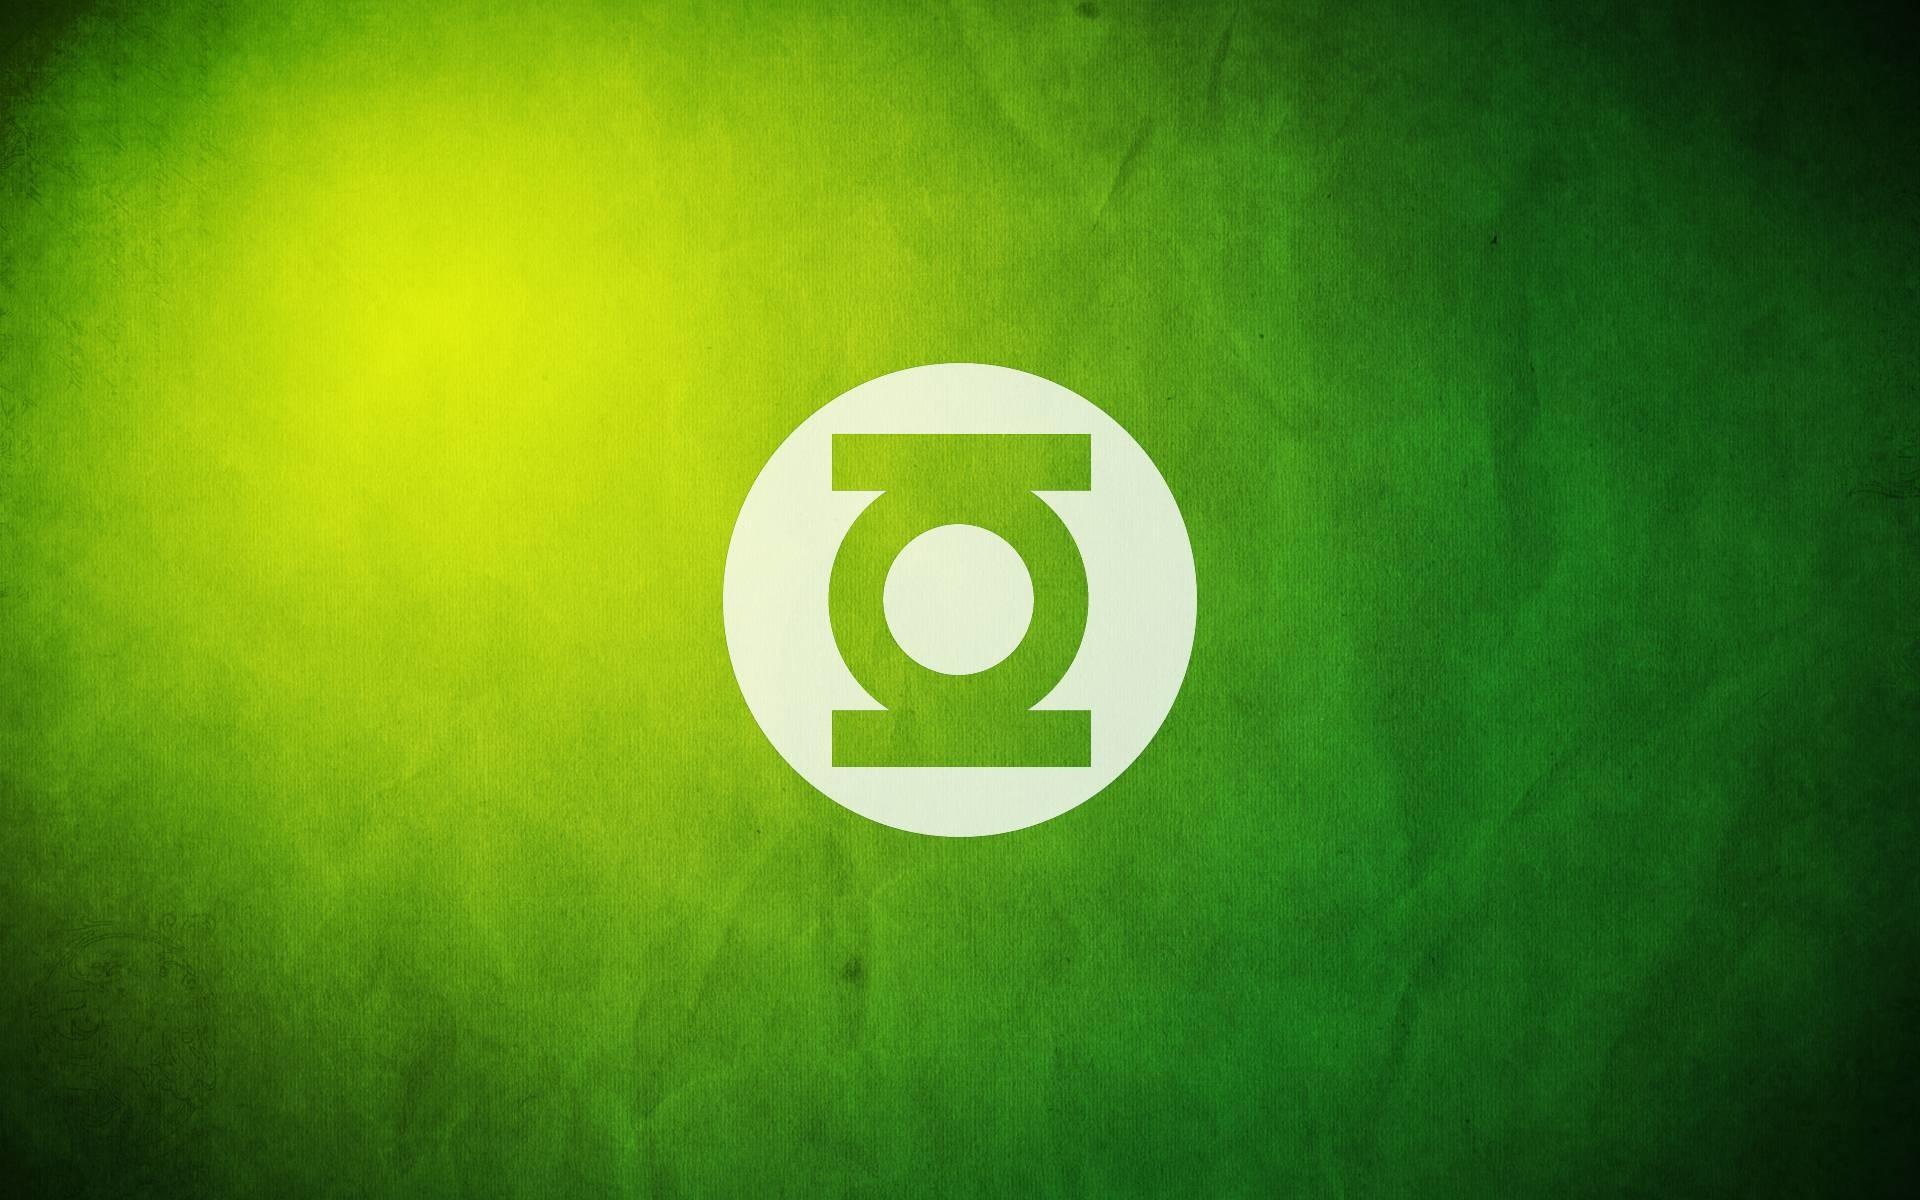 Green Lantern Oath Wallpaper 68 Images